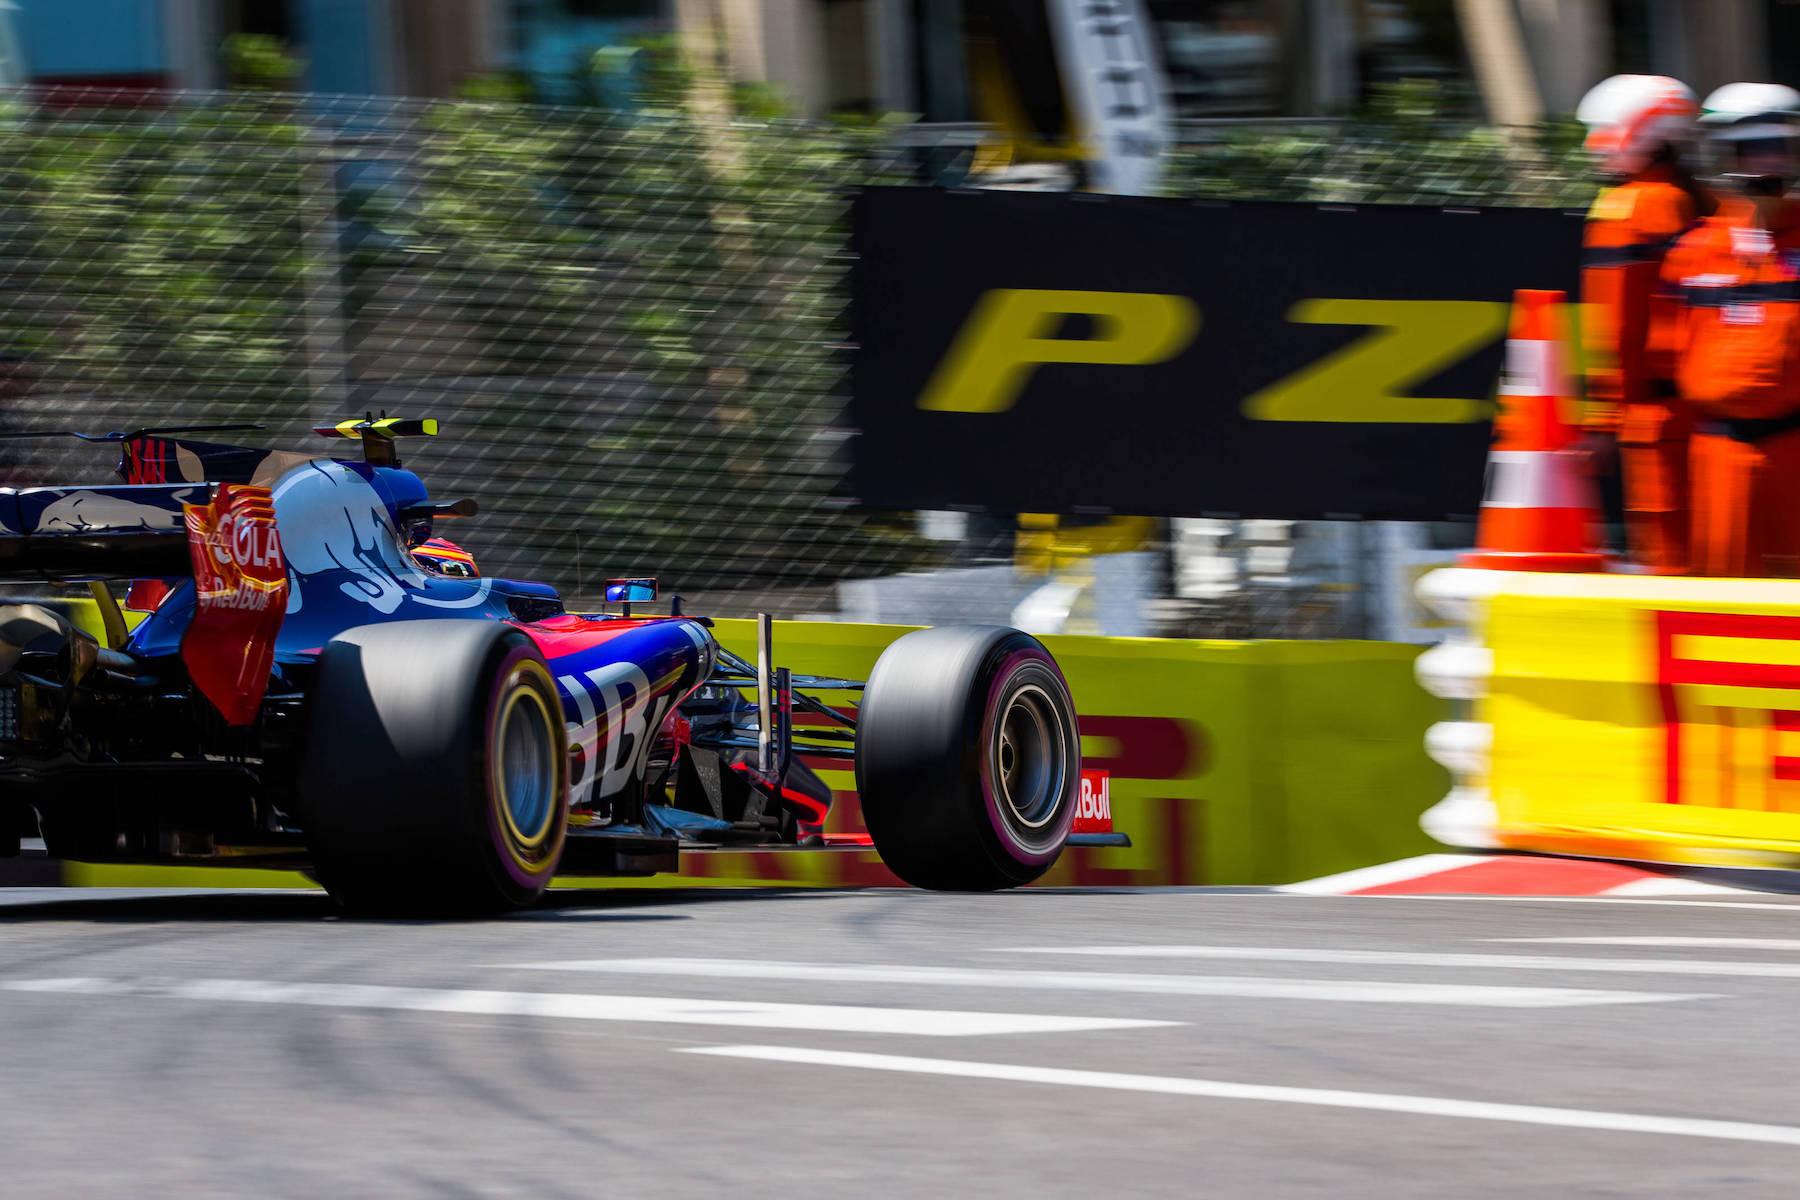 G 2017 Carlos Sainz | Toro Rosso STR12 | 2017 Monaco GP 3 copy.jpg